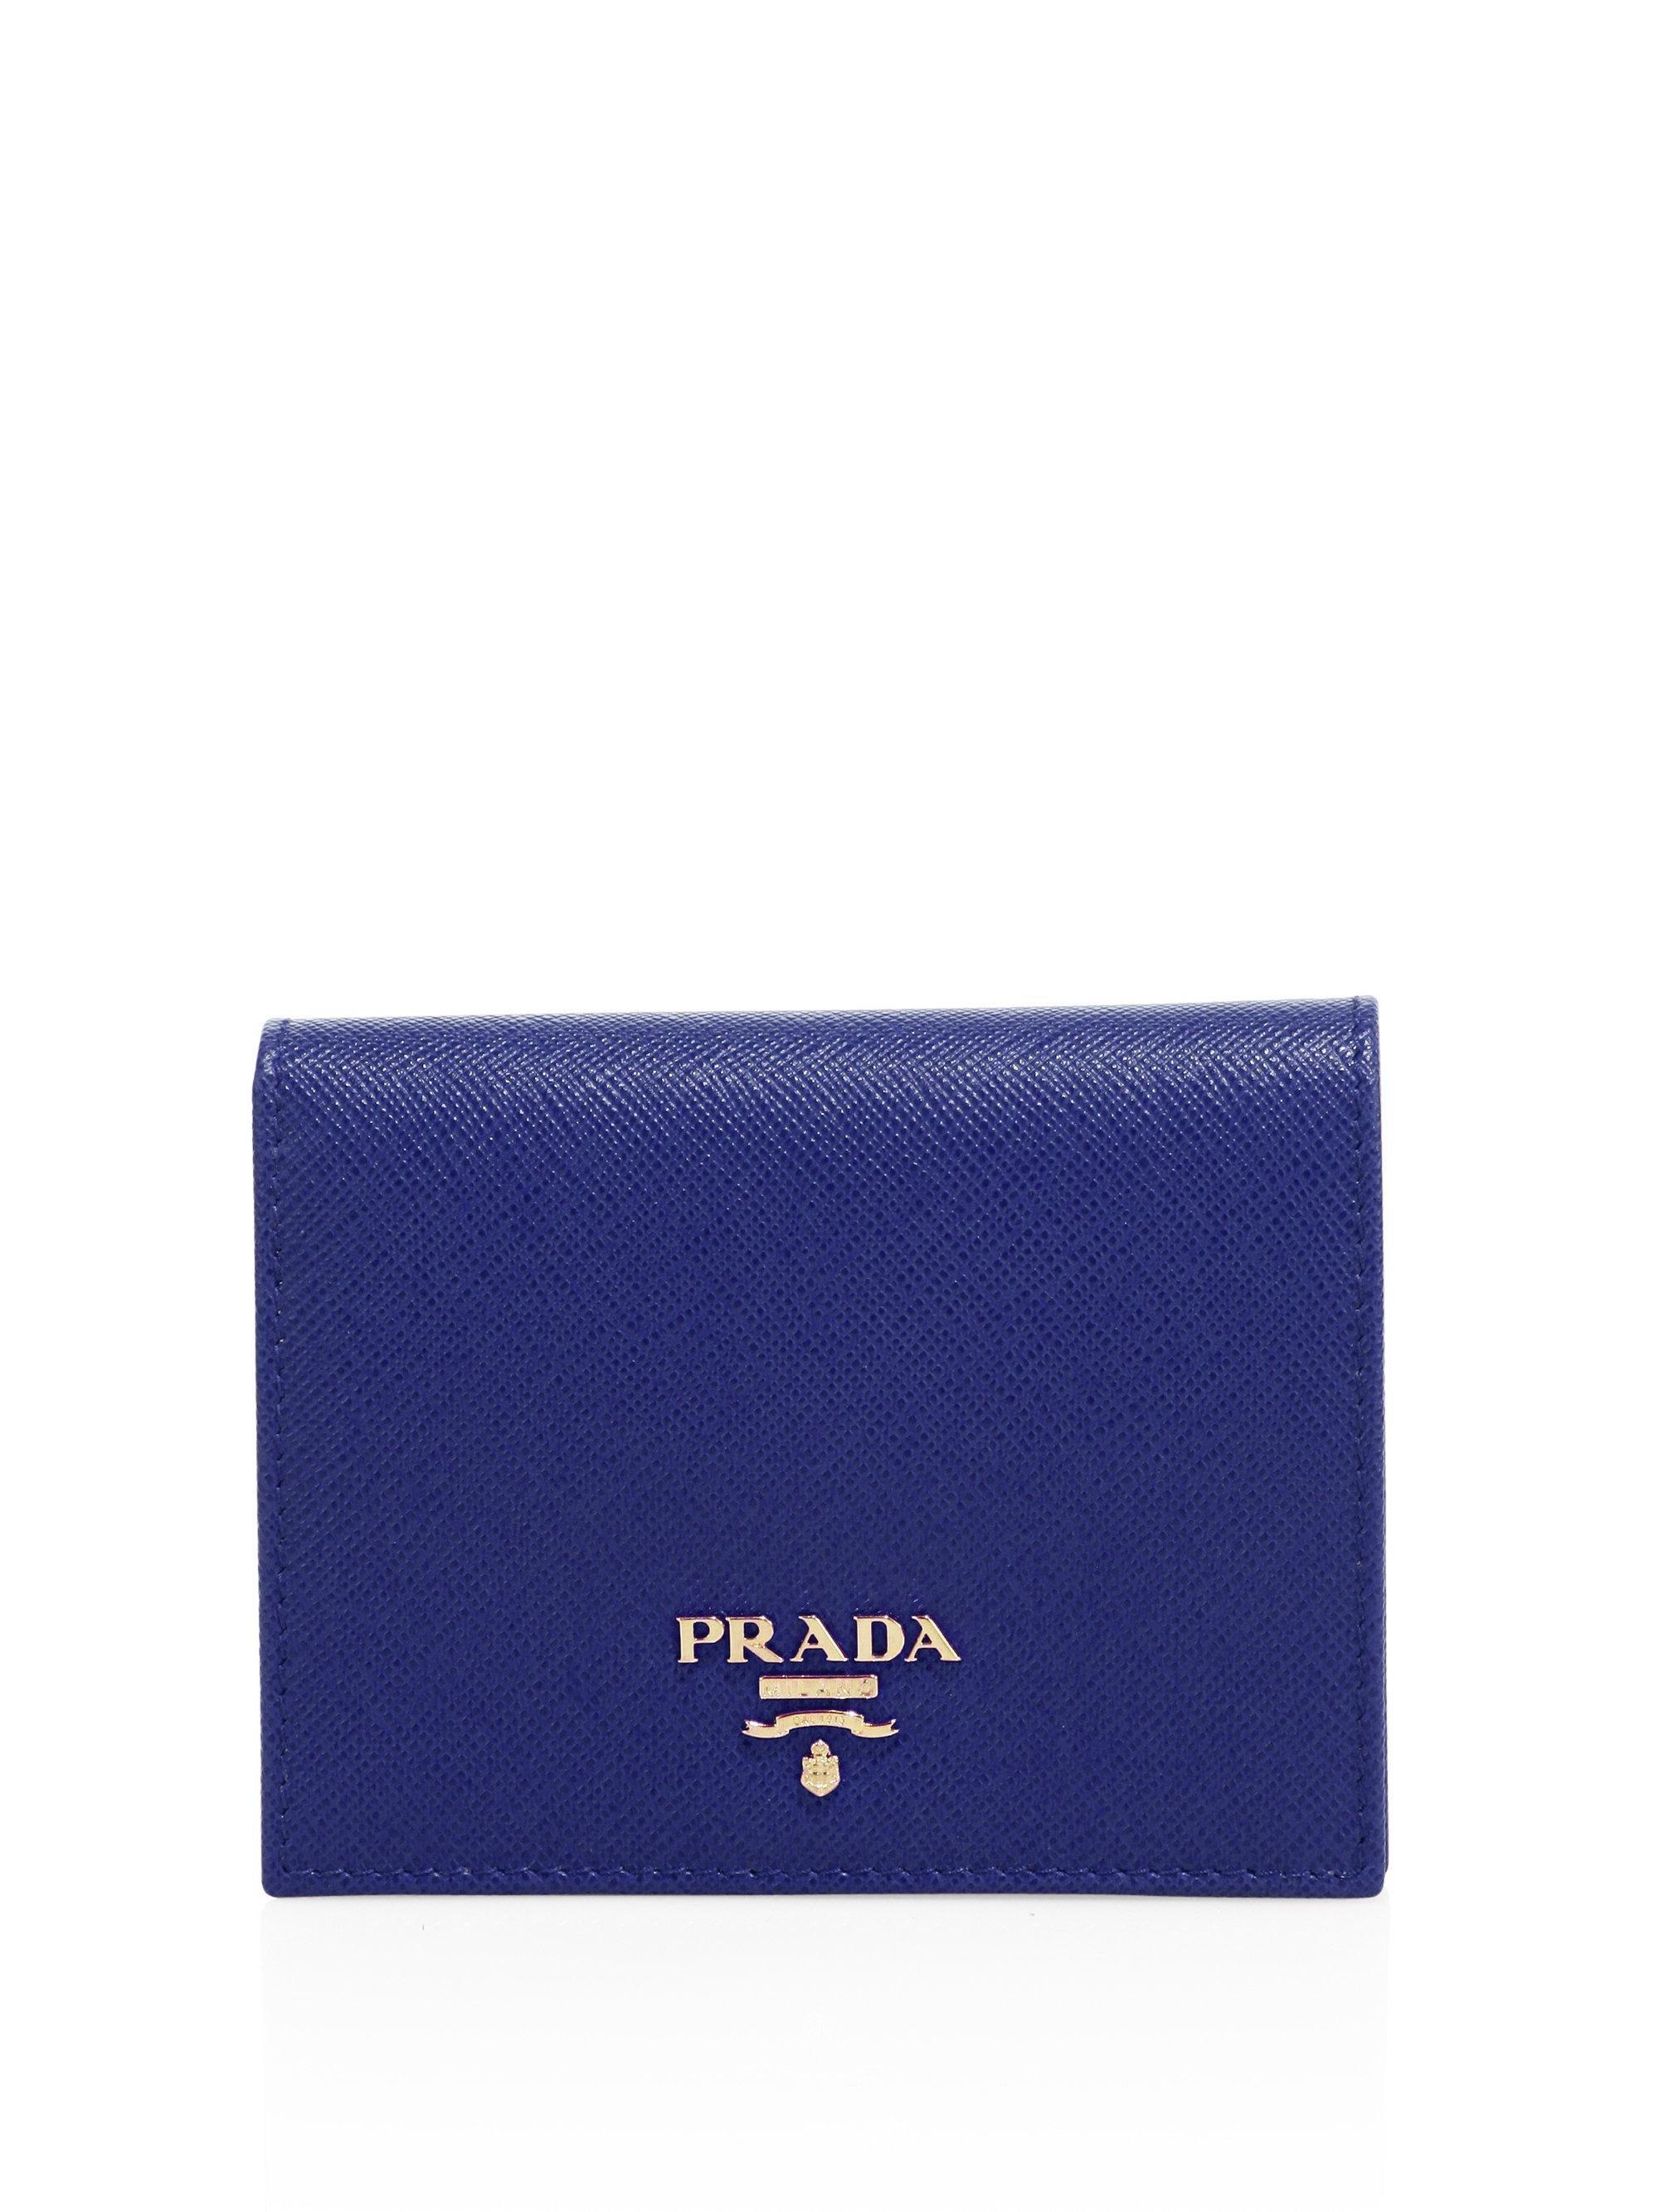 9212cb68d105 ... free shipping lyst prada mini saffiano leather bifold wallet in blue  433ee 4364b